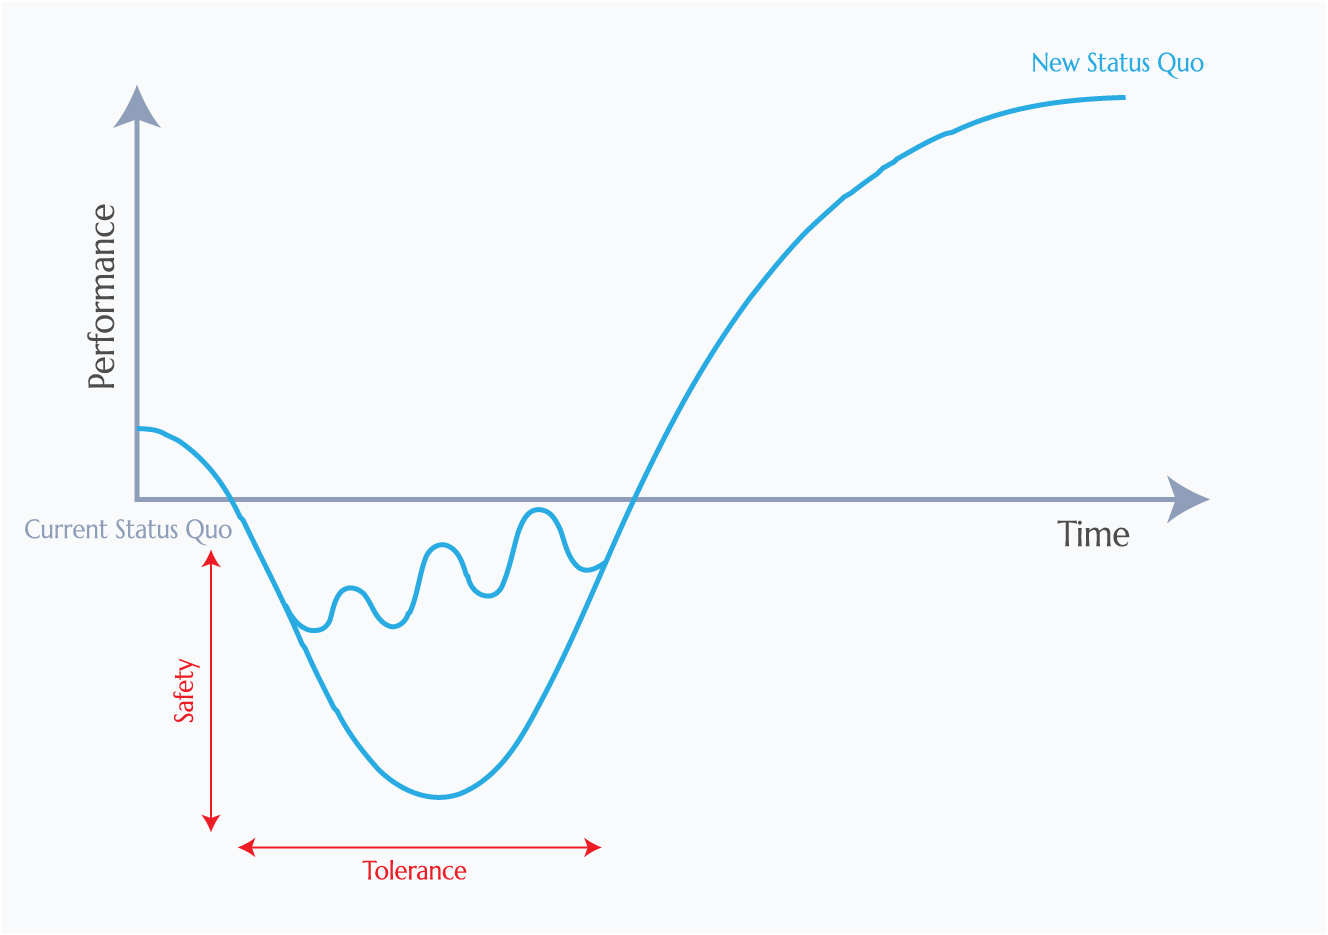 J curve effect - evolutionary change - patience, safety